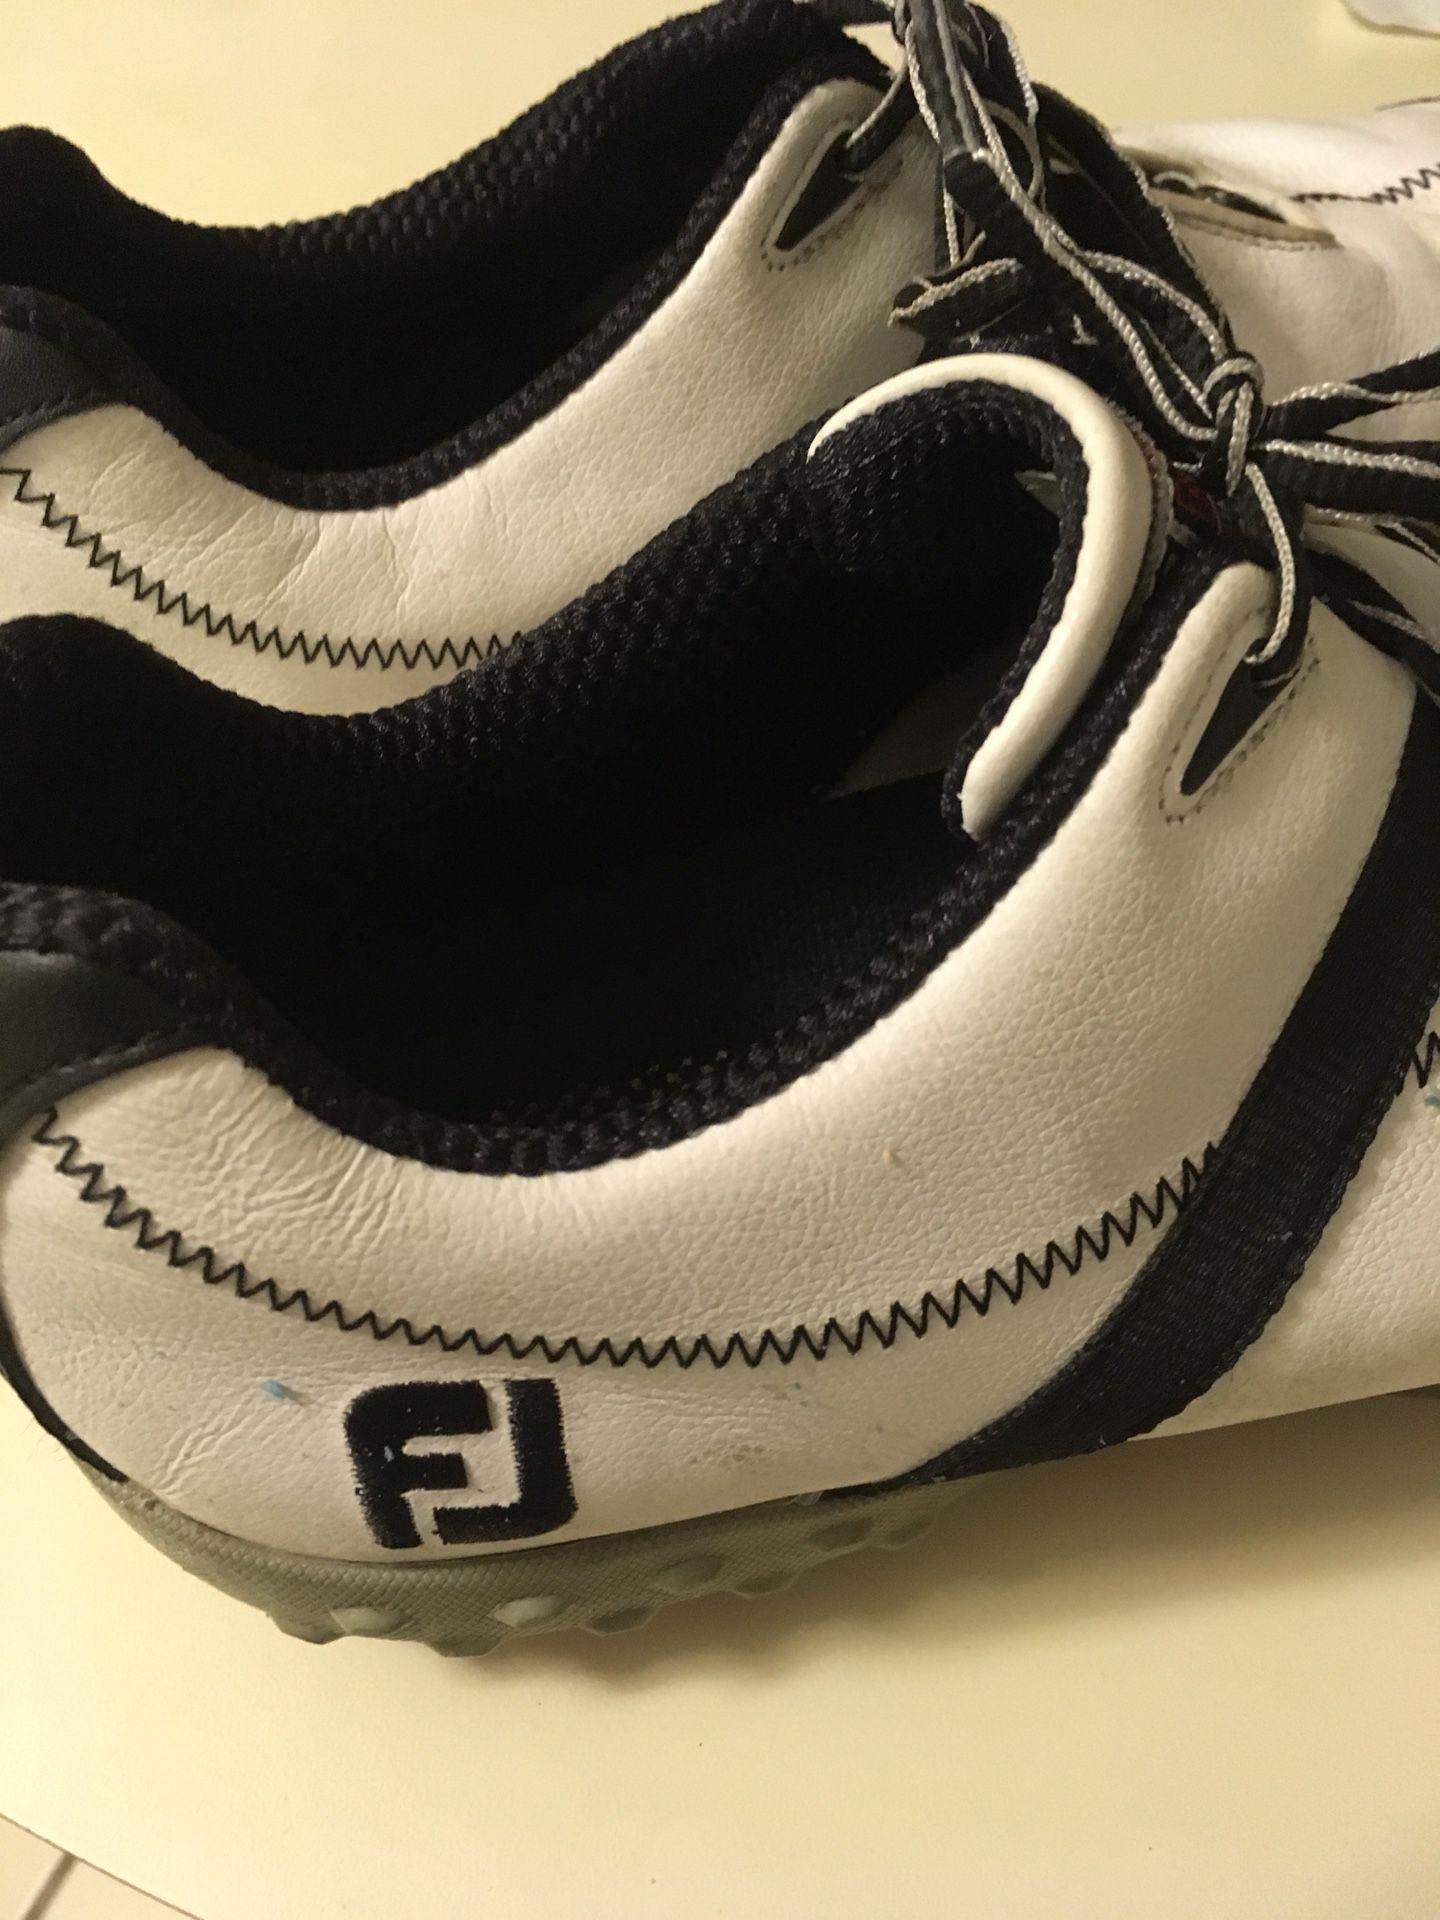 FootJoy size 10 golf shoes